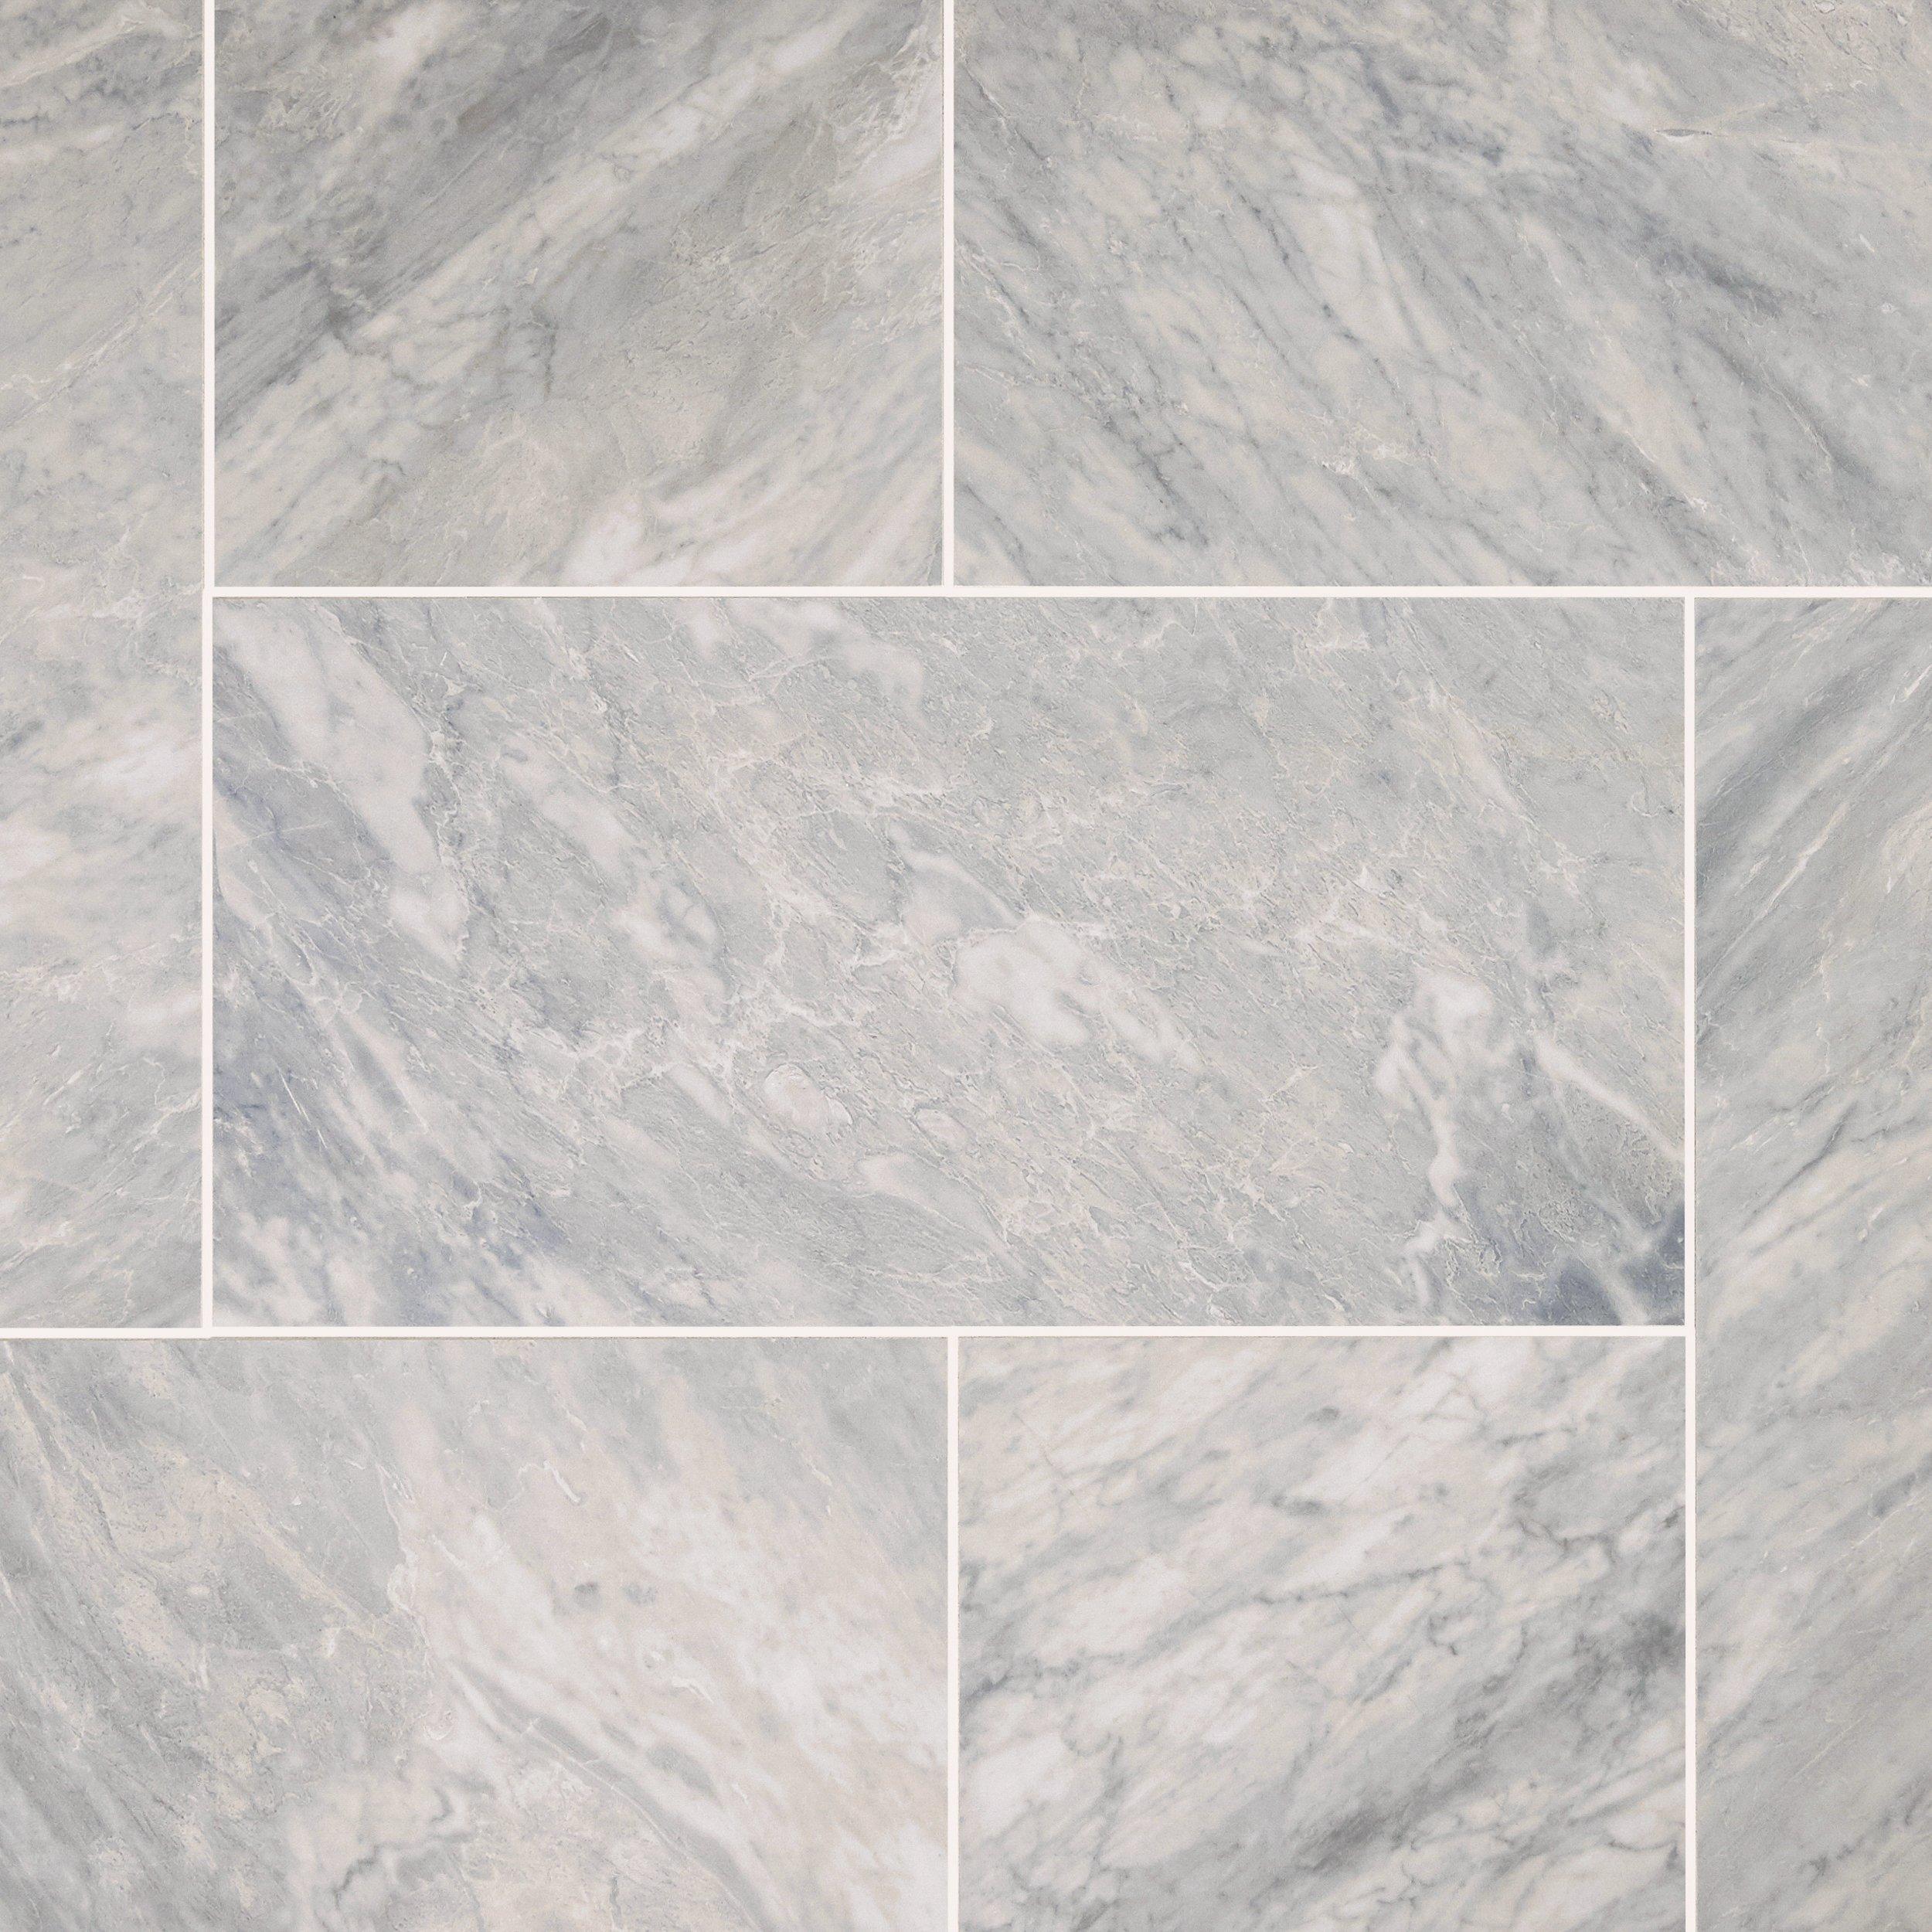 Carrara Blue Porcelain Tile Floor Decor In 2020 Stone Look Tile Marble Look Tile Porcelain Tile